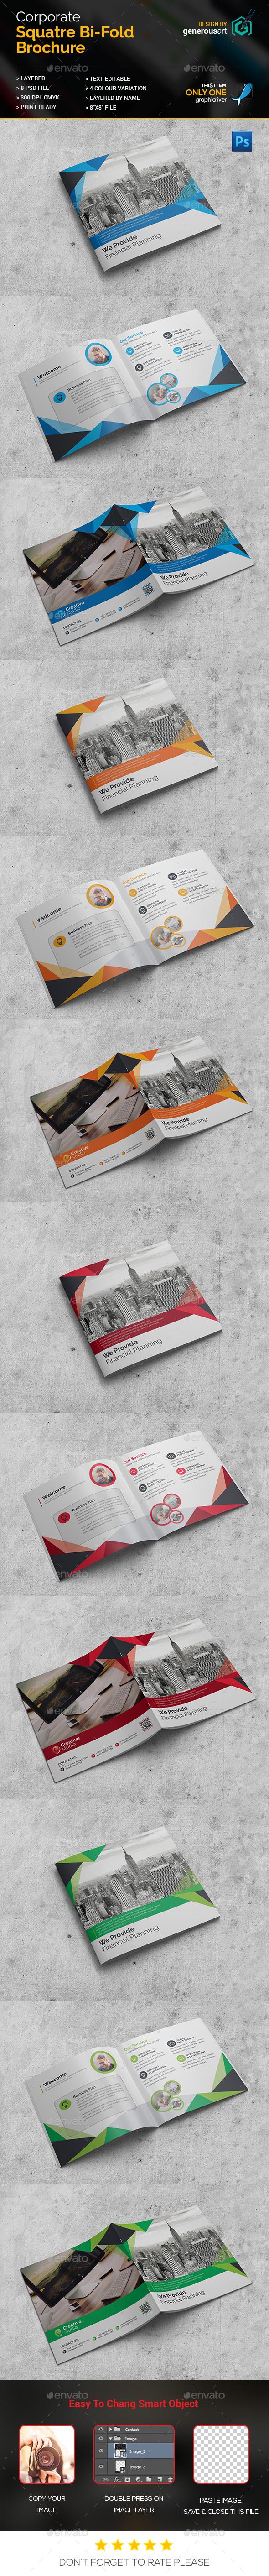 Square Bi-Fold Brochure_New - Corporate Brochures